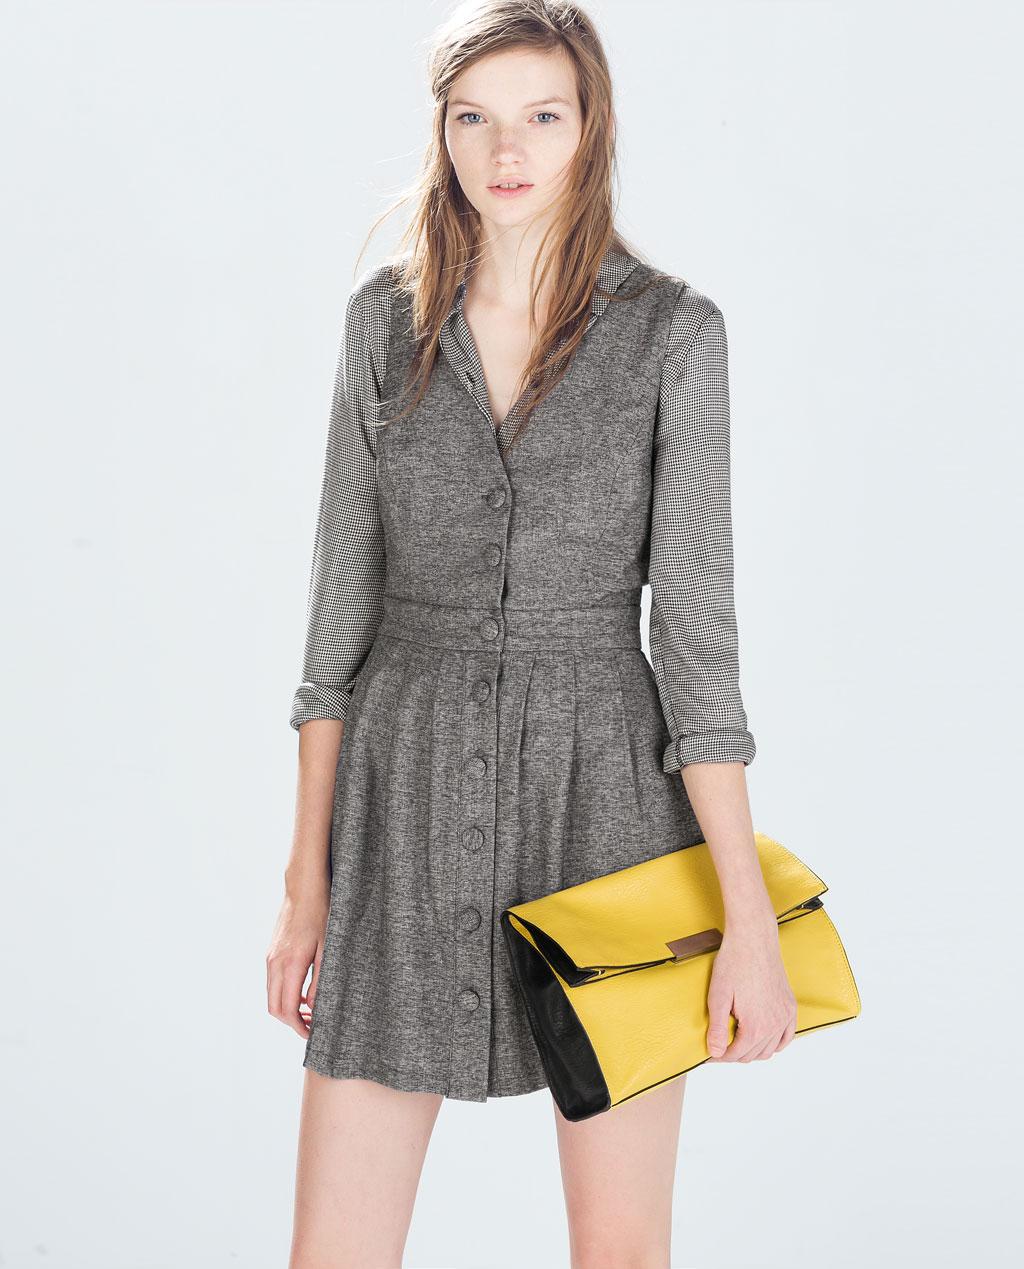 Zara Pinafore Dress